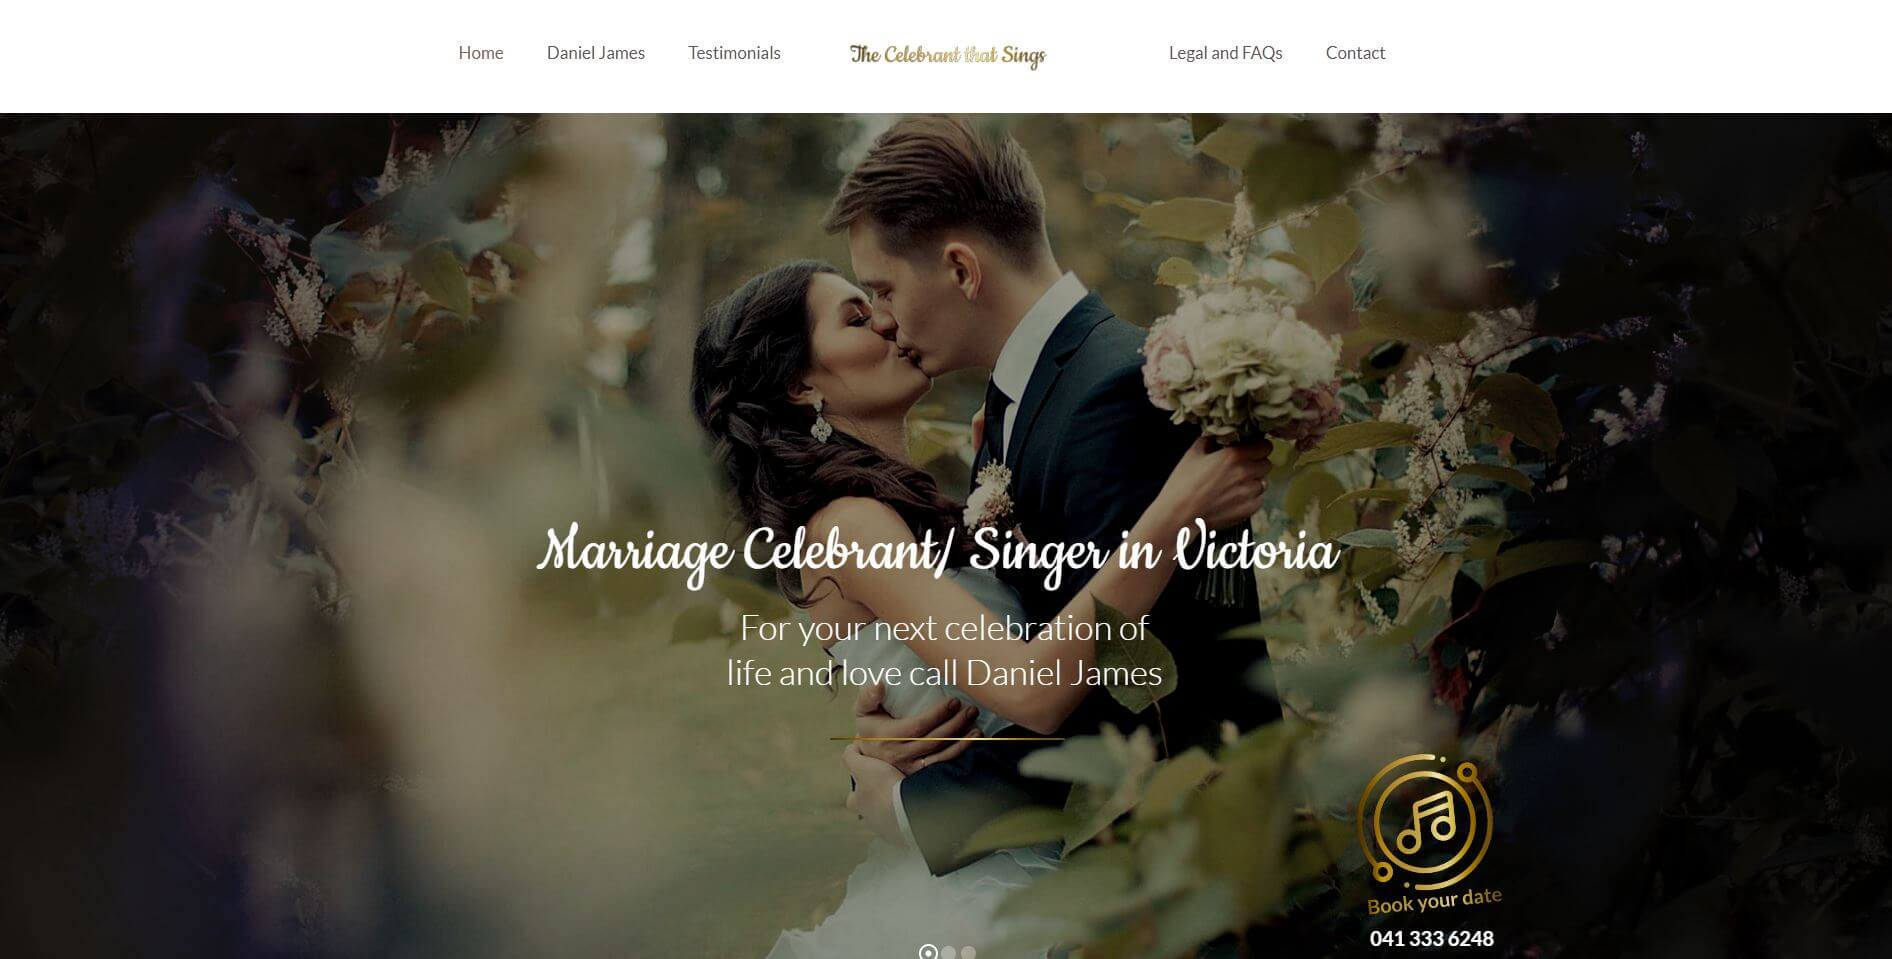 The Celebrant That Sings Melbourne Hire Weddingv